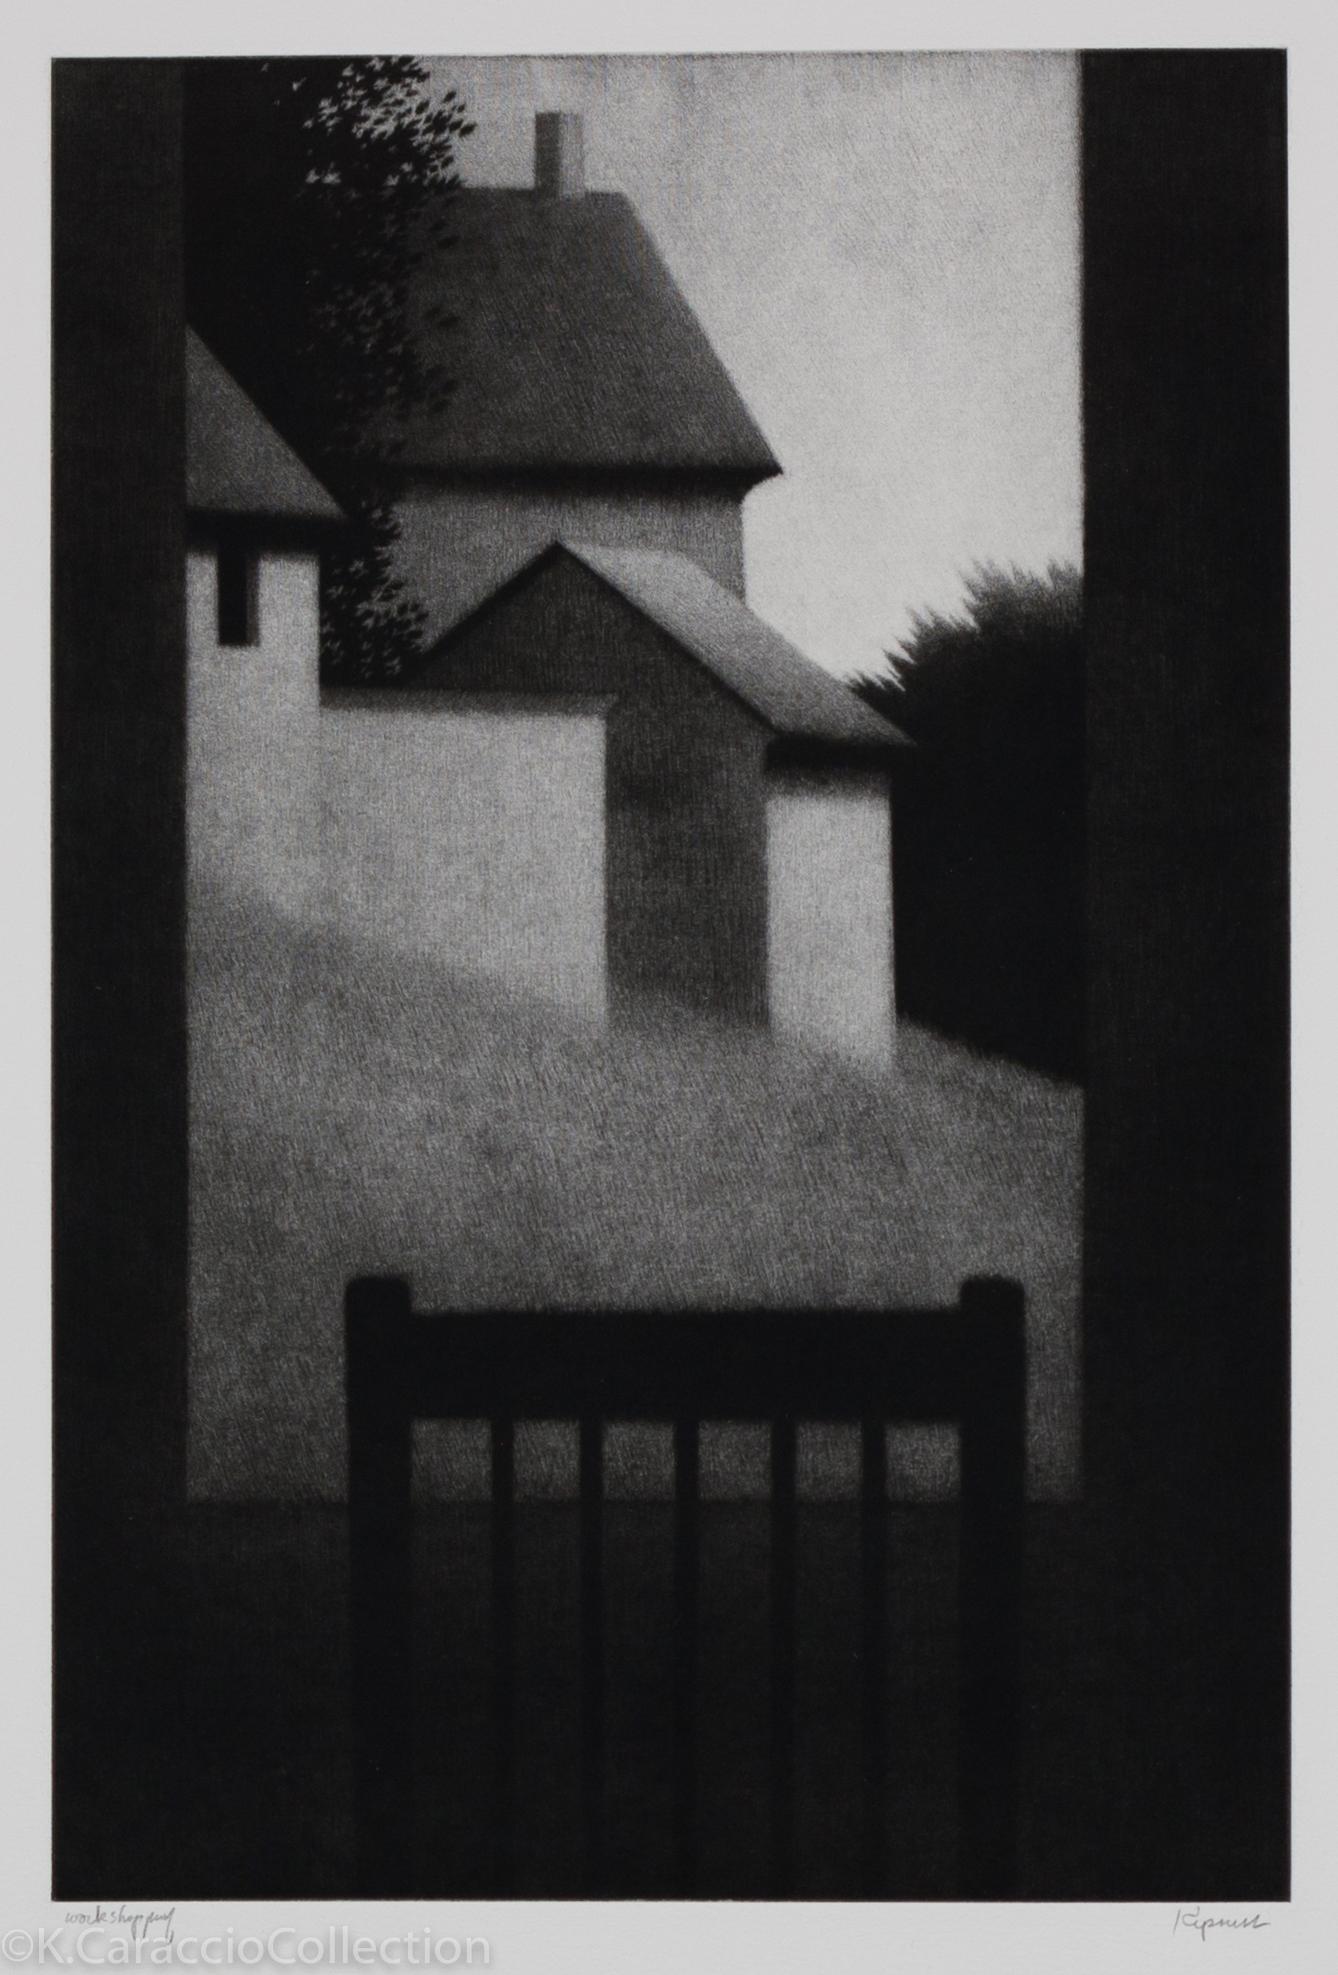 Window at Dusk, 1997